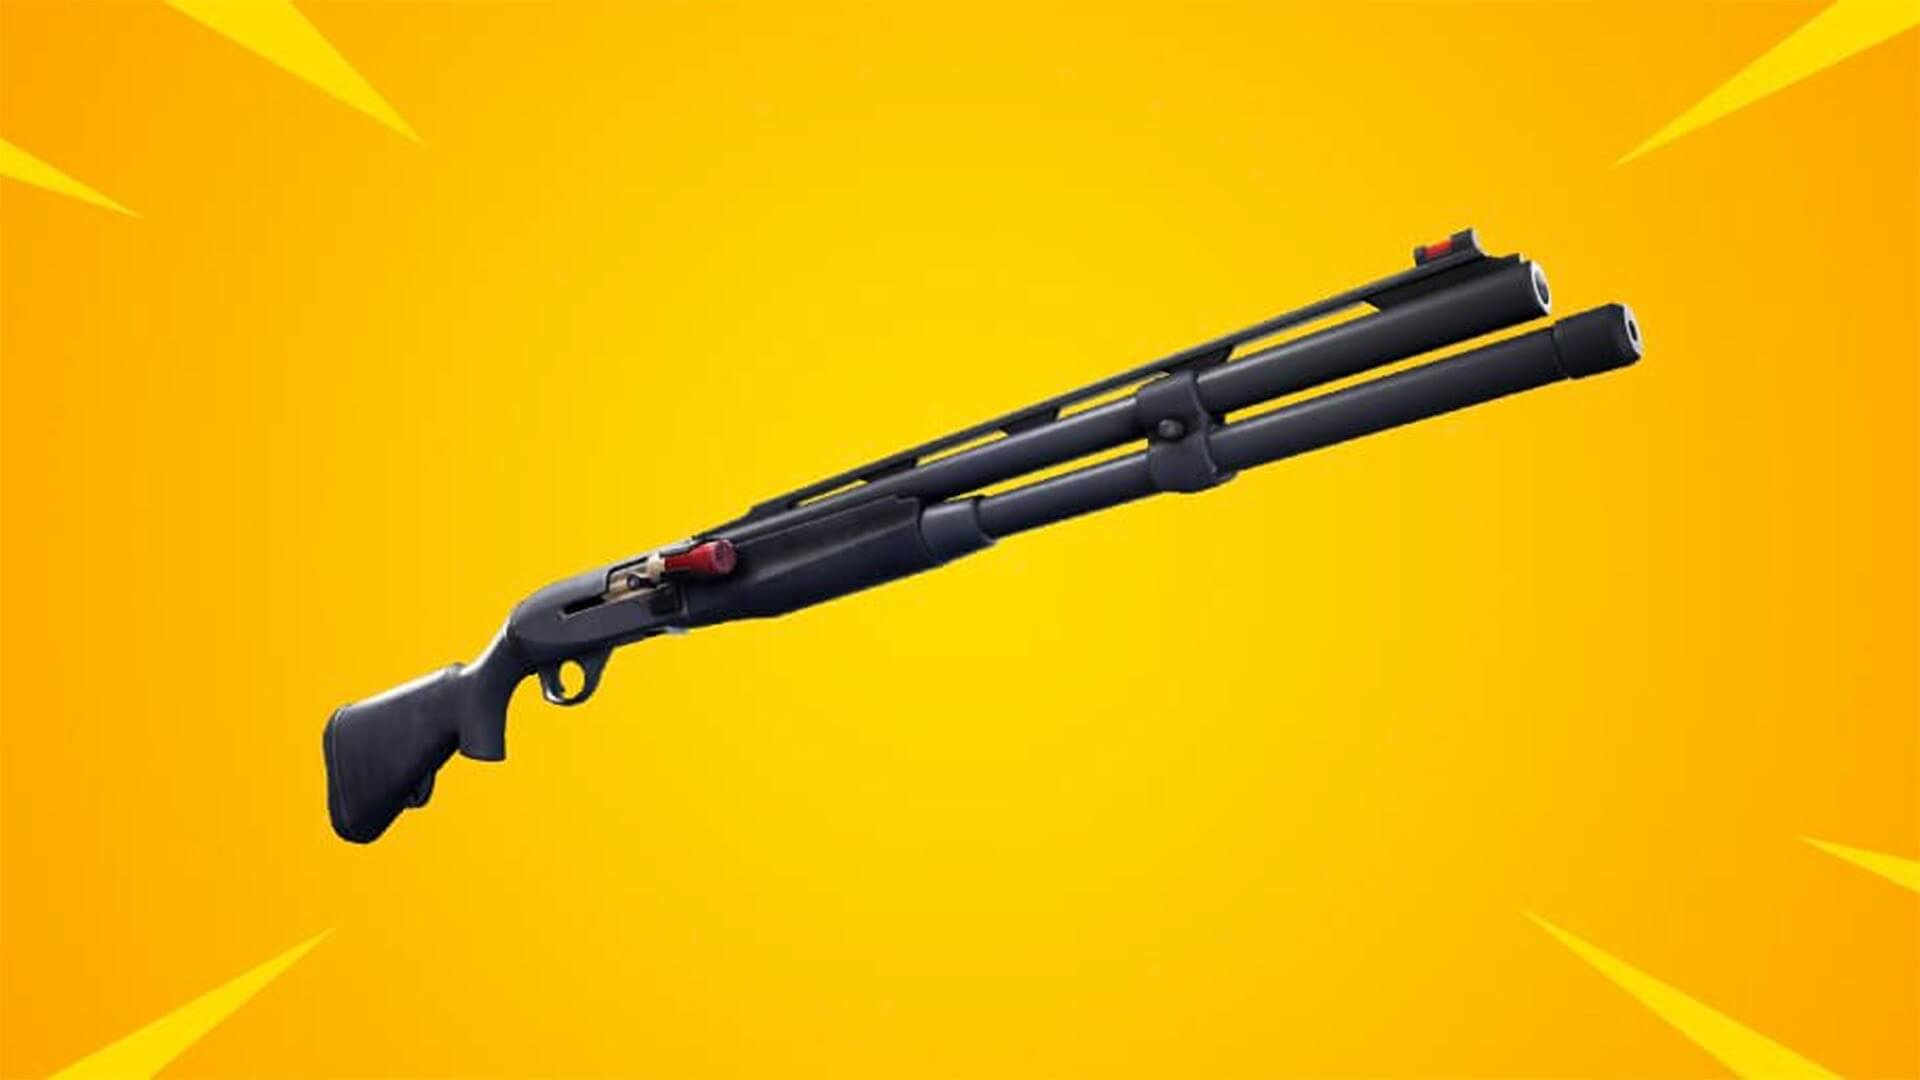 Fortnite patch v14.30: Combat Shotgun buff, Black Panther ability & more